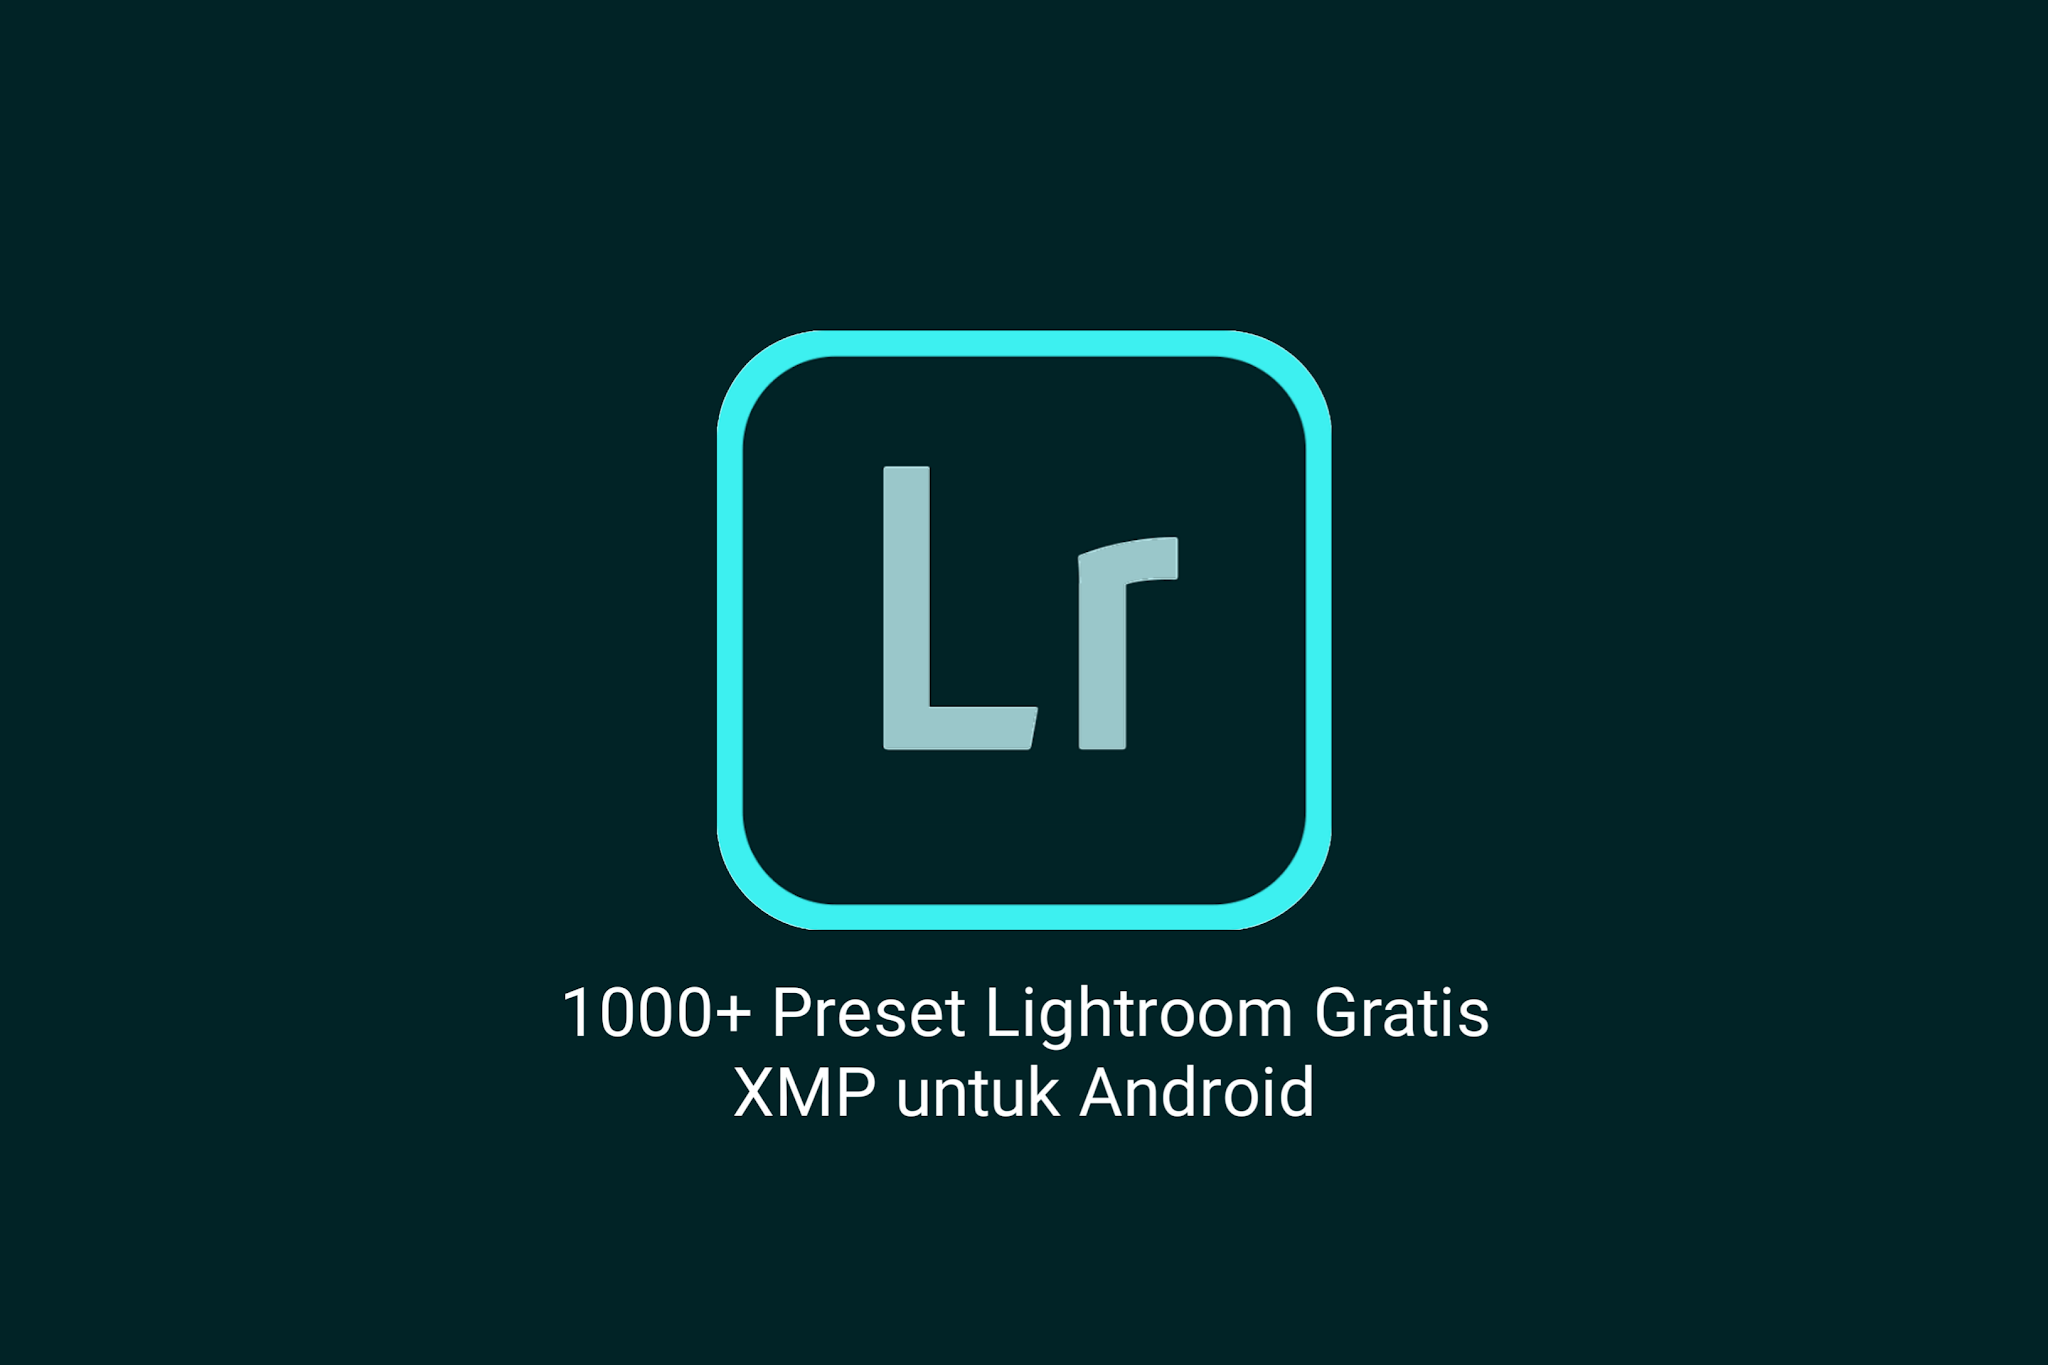 1000+ Preset Lightroom Gratis XMP untuk Android